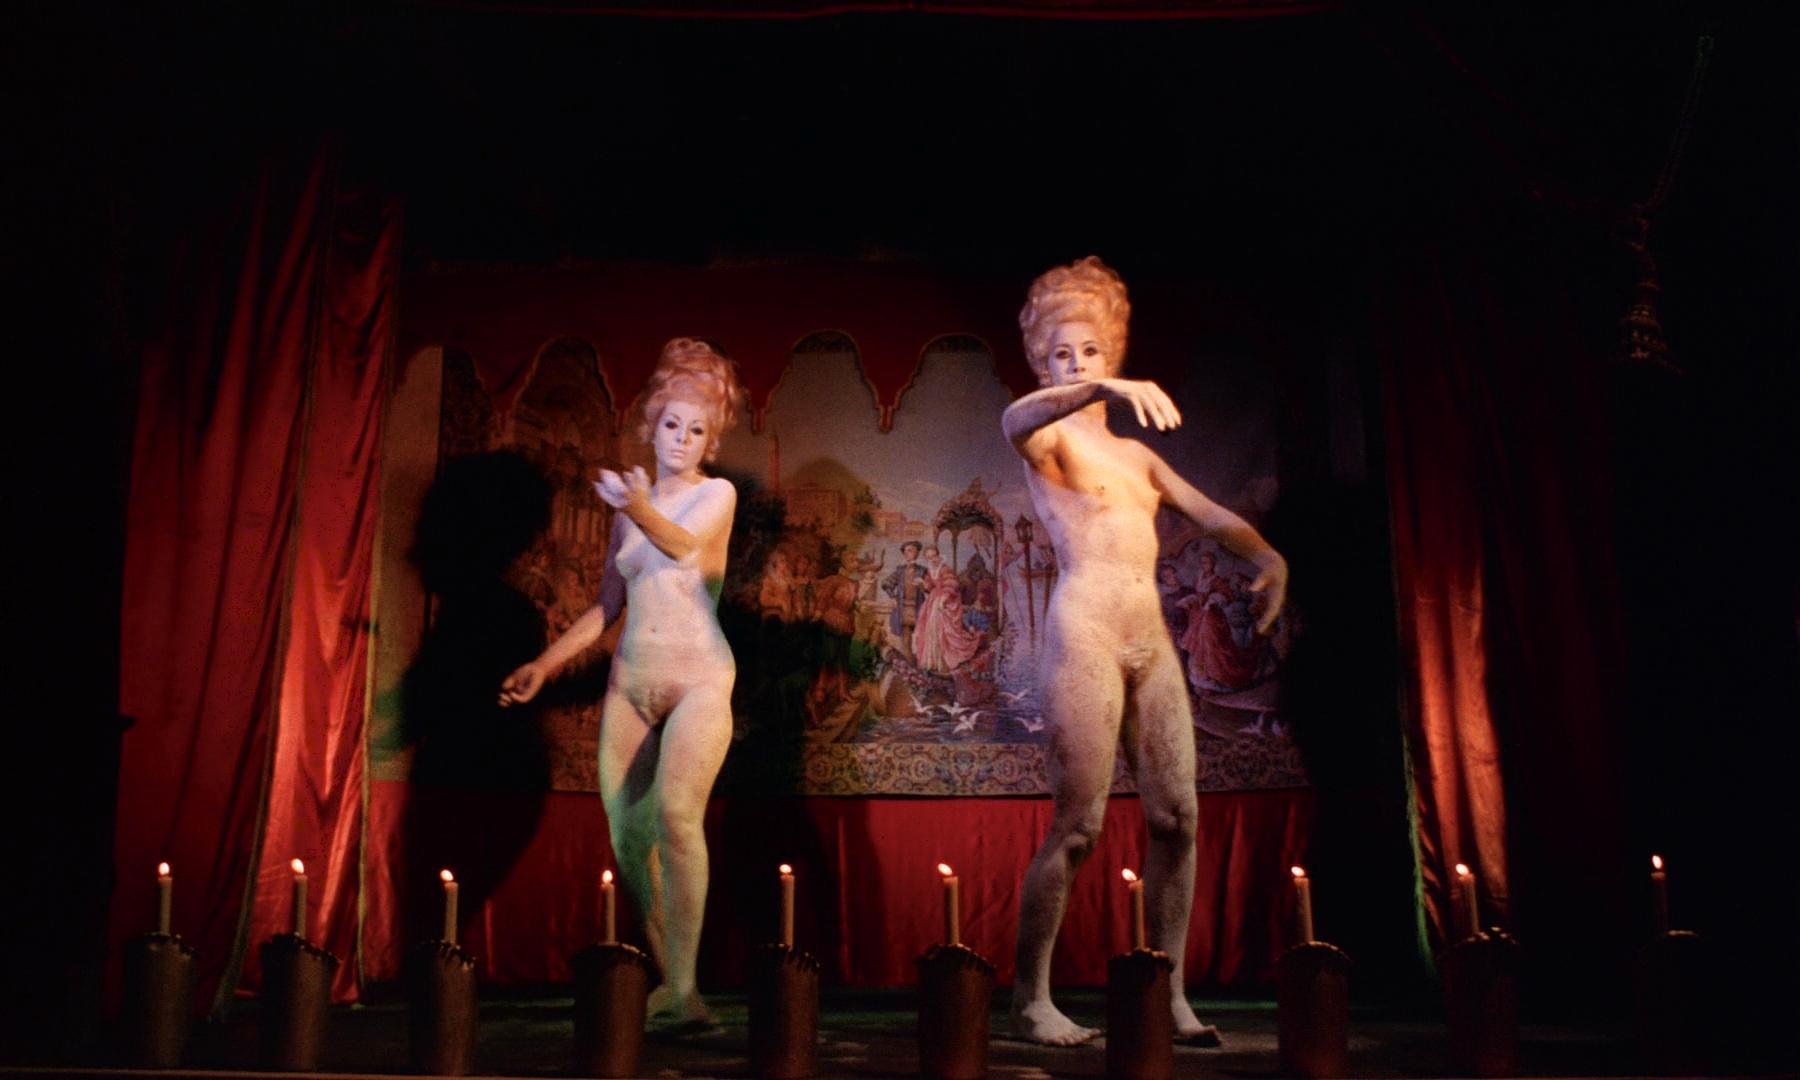 Romina Power nude toplees, Sylva Koscina nude Rosemary Dexter and Maria Rohm nude bush - Marquis de Sade - Justine (IT-1969) HD 1080p BluRay (5)